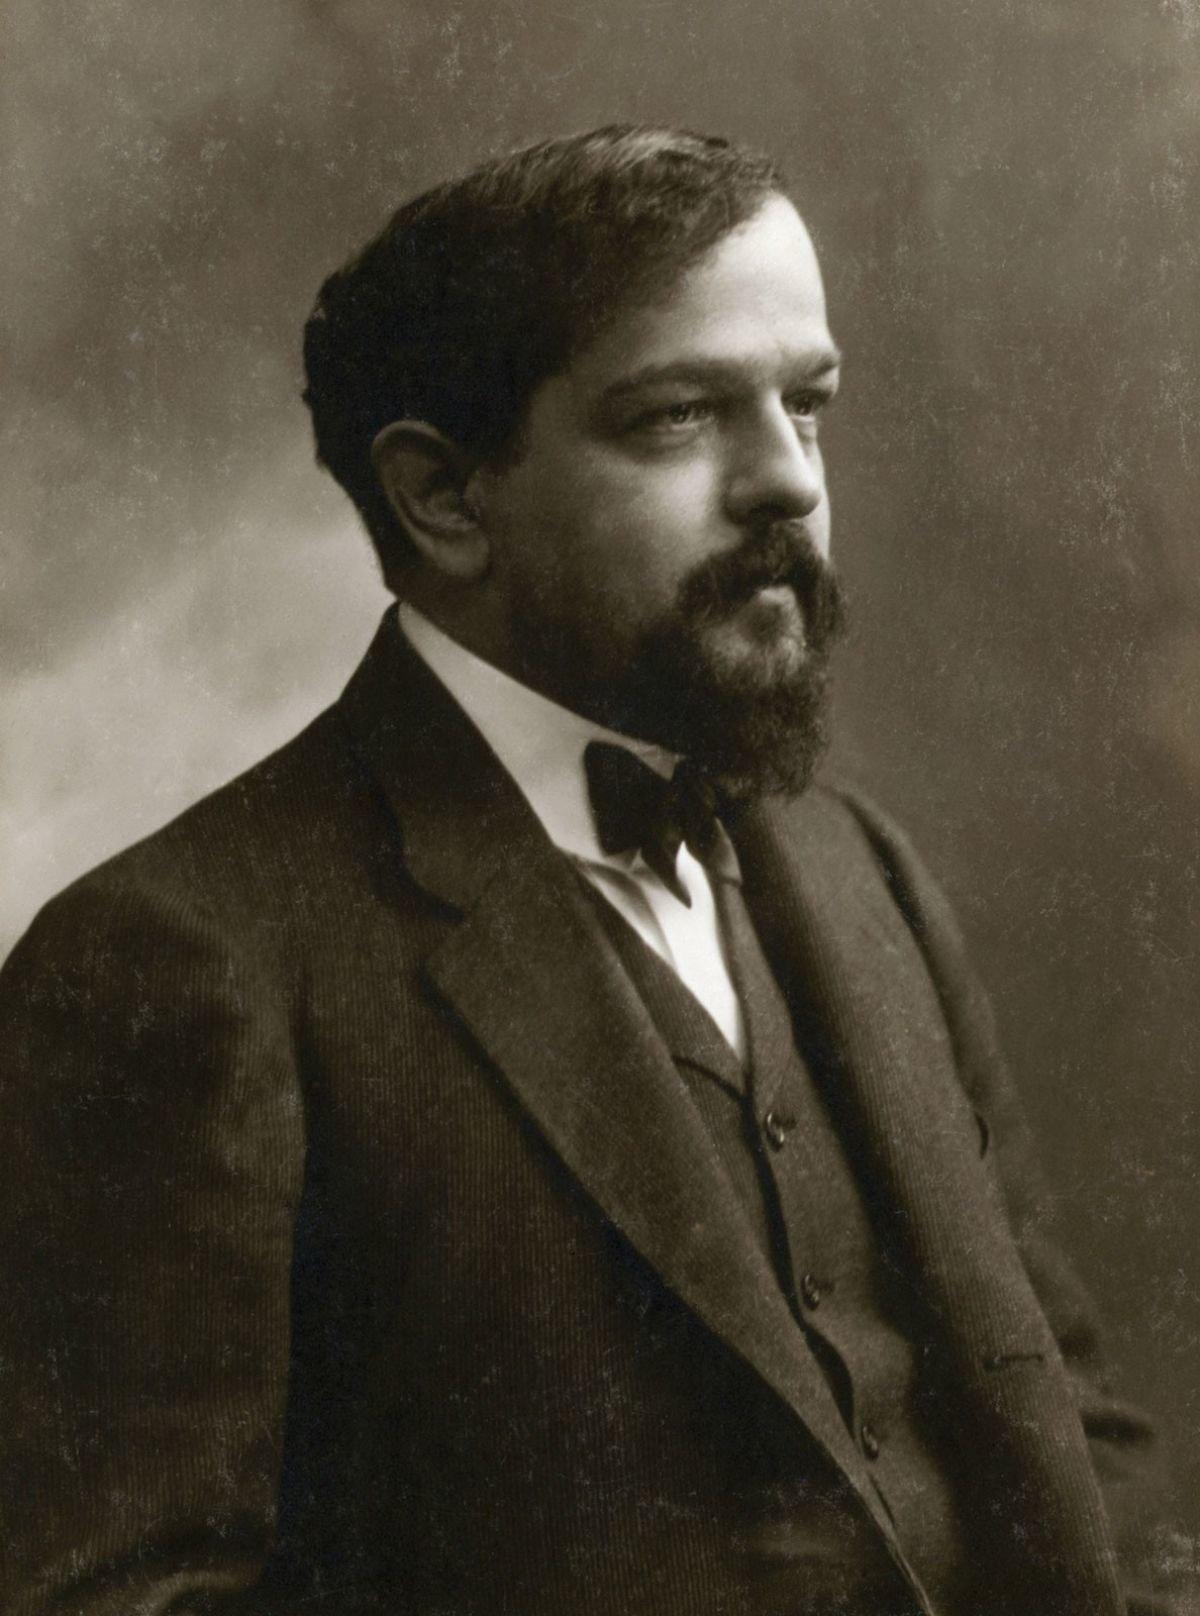 25 марта 1918 года скончался Клод Дебюсси